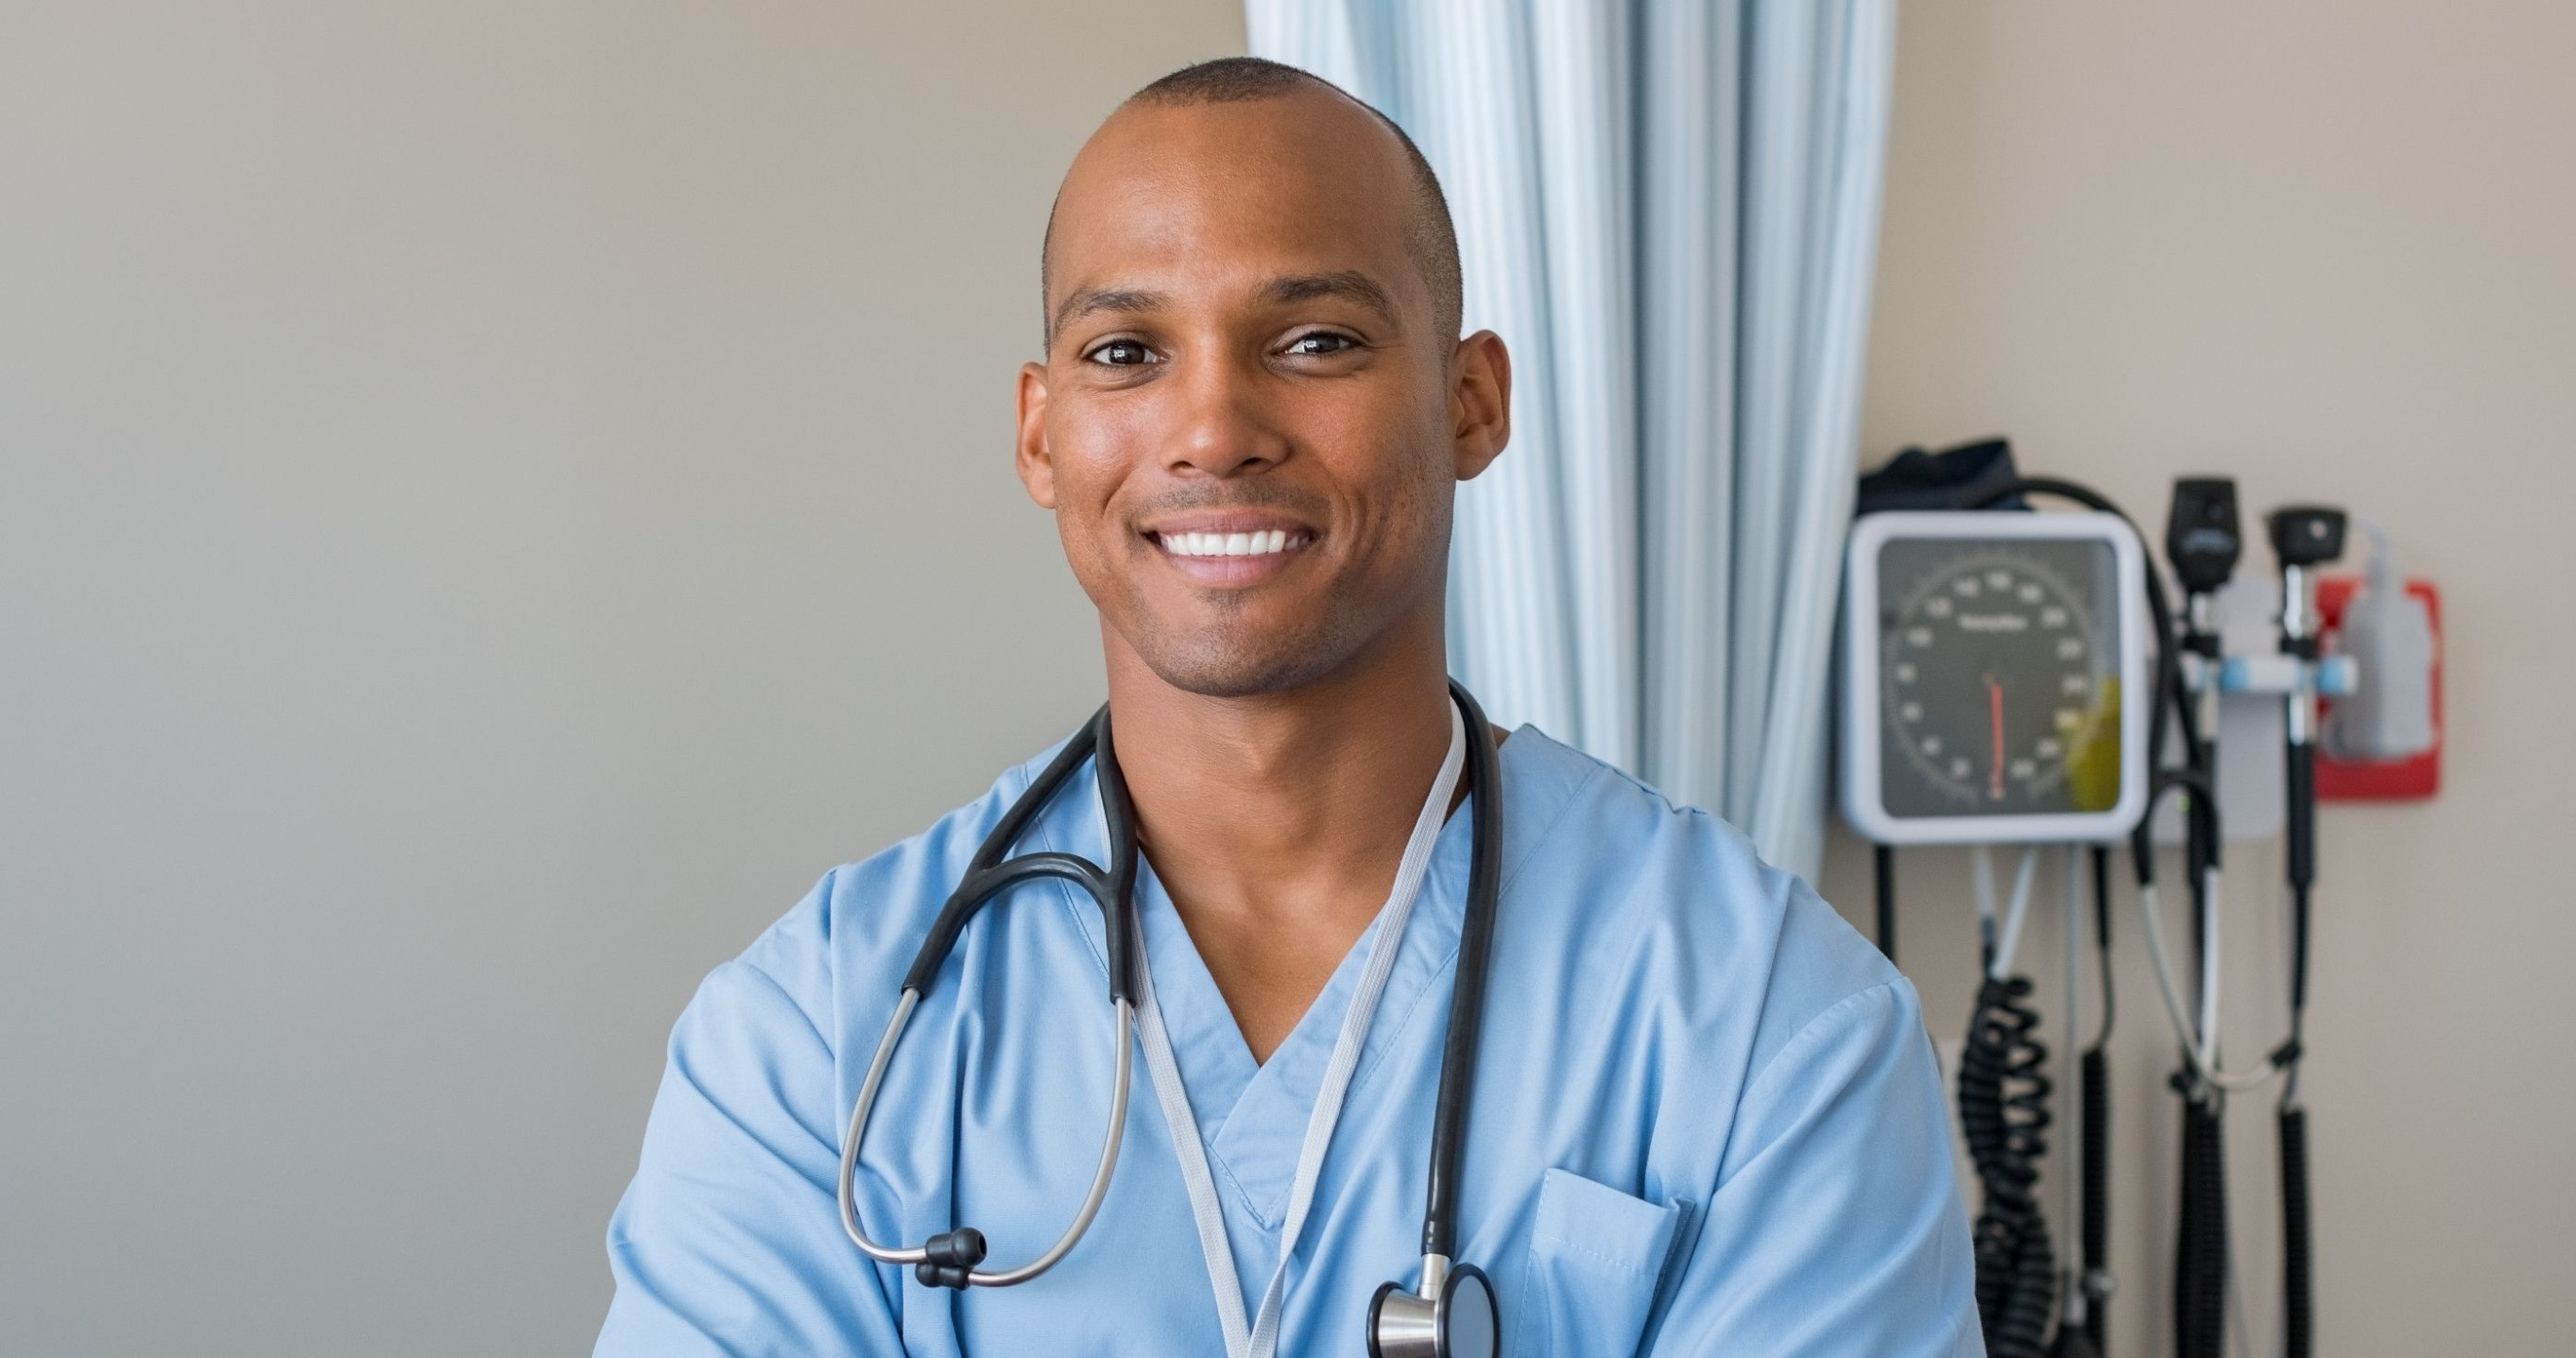 CONCIERGE MEDICINE / URGENT CARE